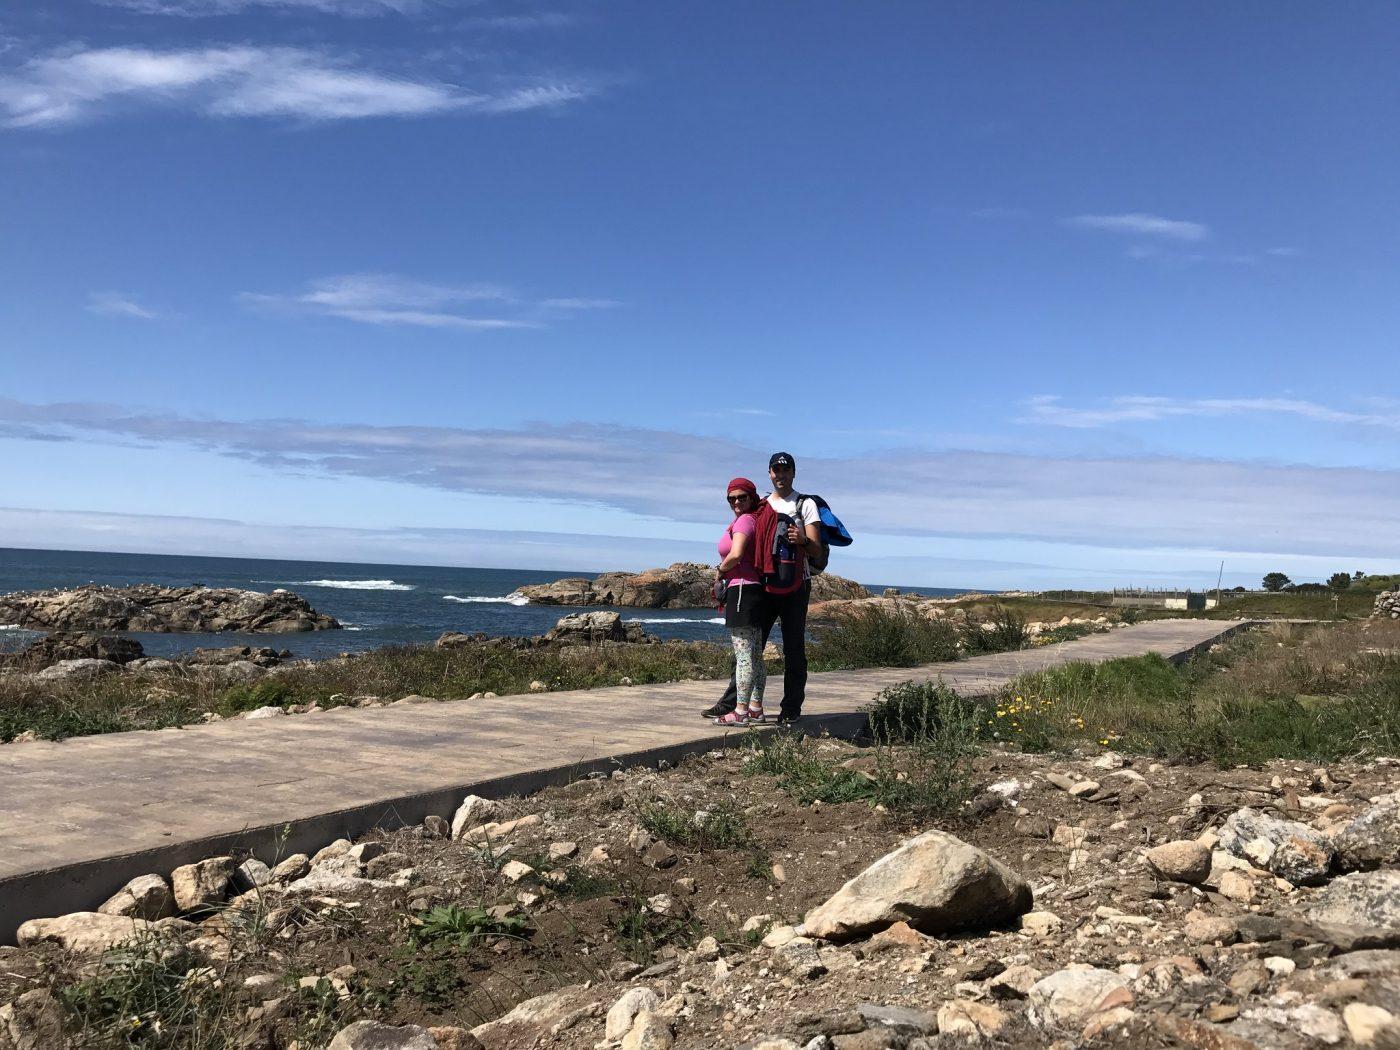 Camino Portuguese Camino de Santiago Pilgrimage